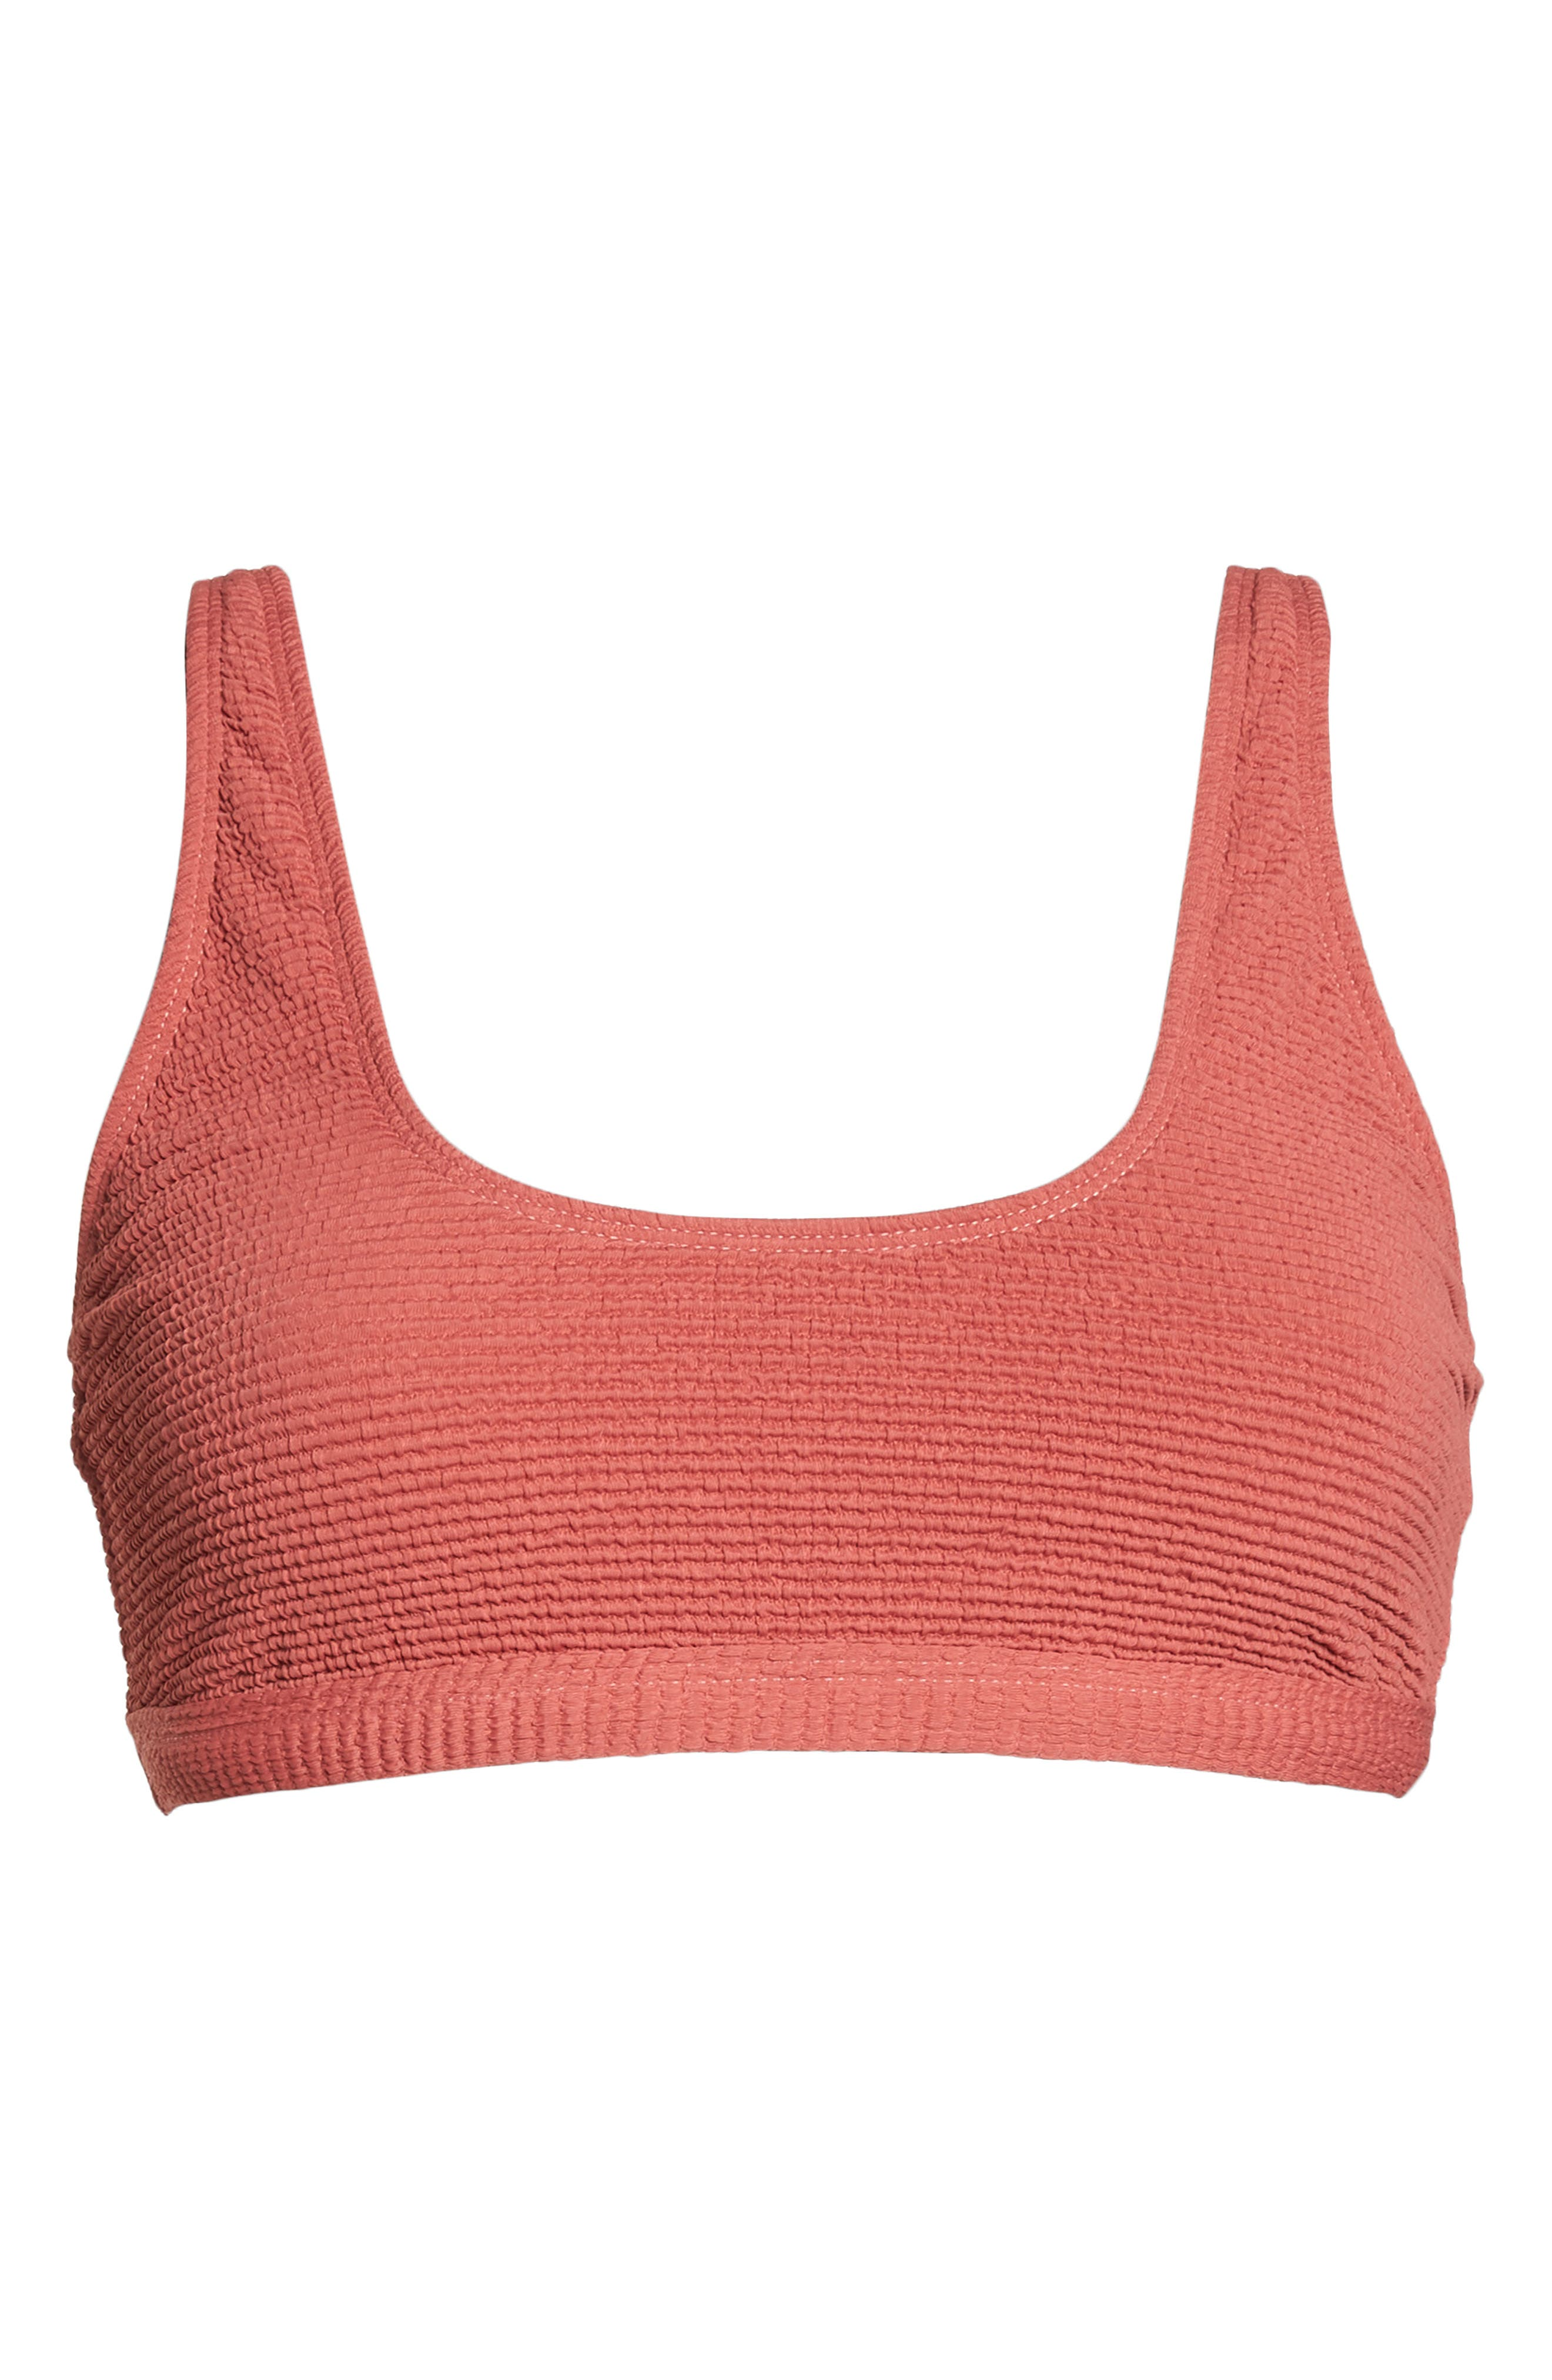 Malibu Bikini Top,                             Alternate thumbnail 6, color,                             RED MINERAL